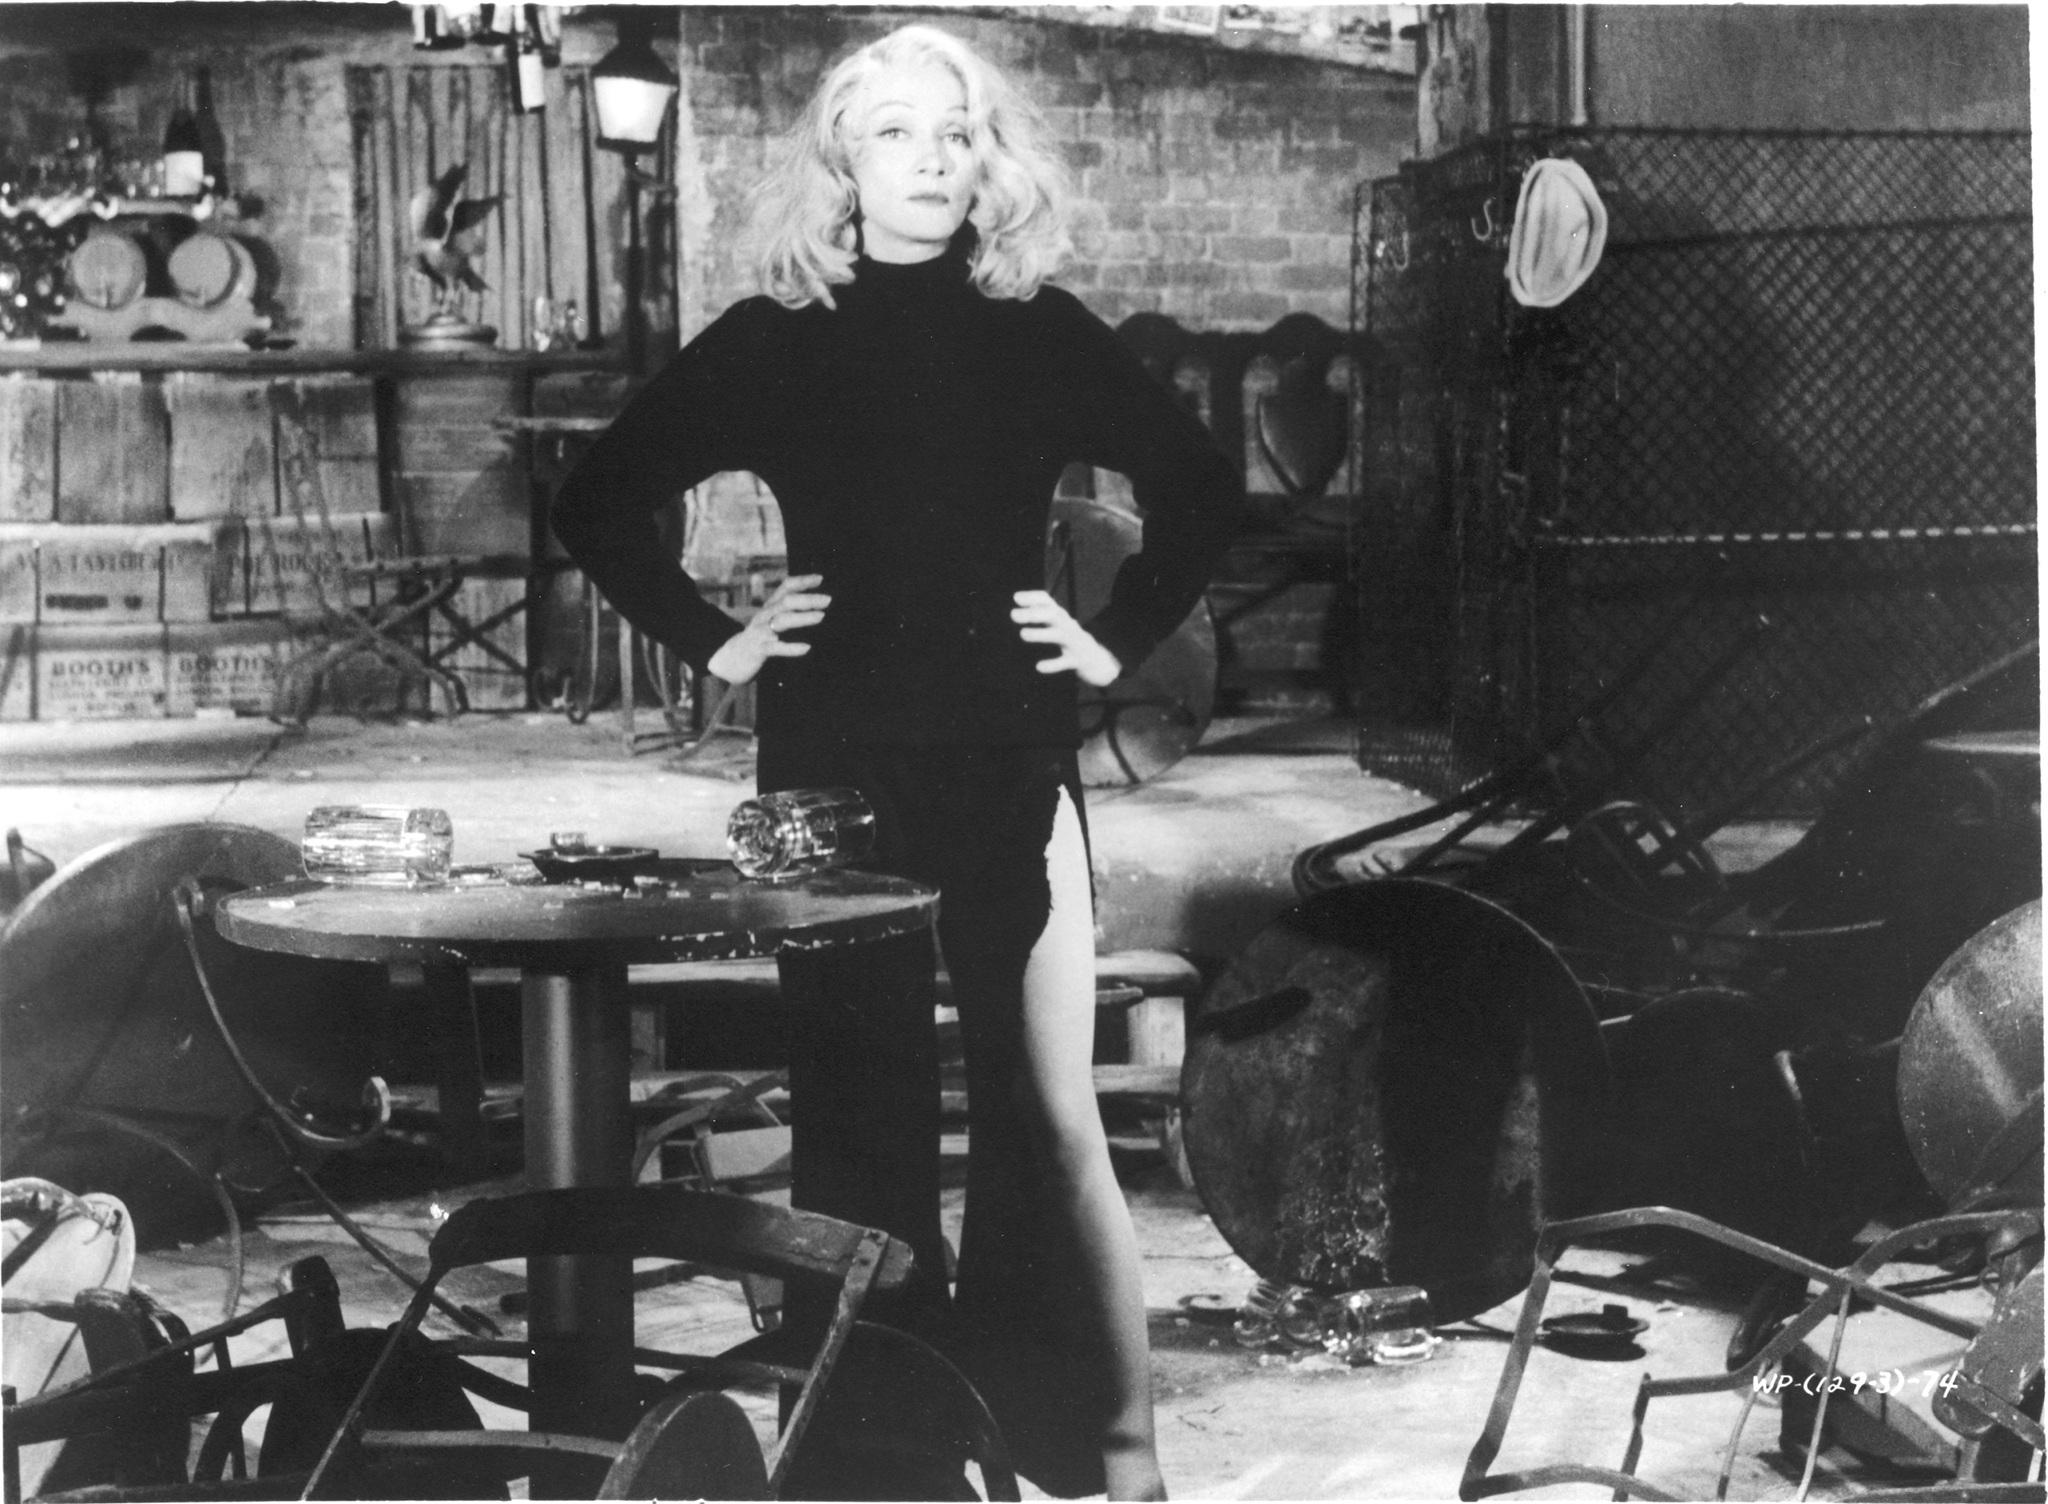 Opus glamurozne Marlene Dietrich u Kinu Kinoteka